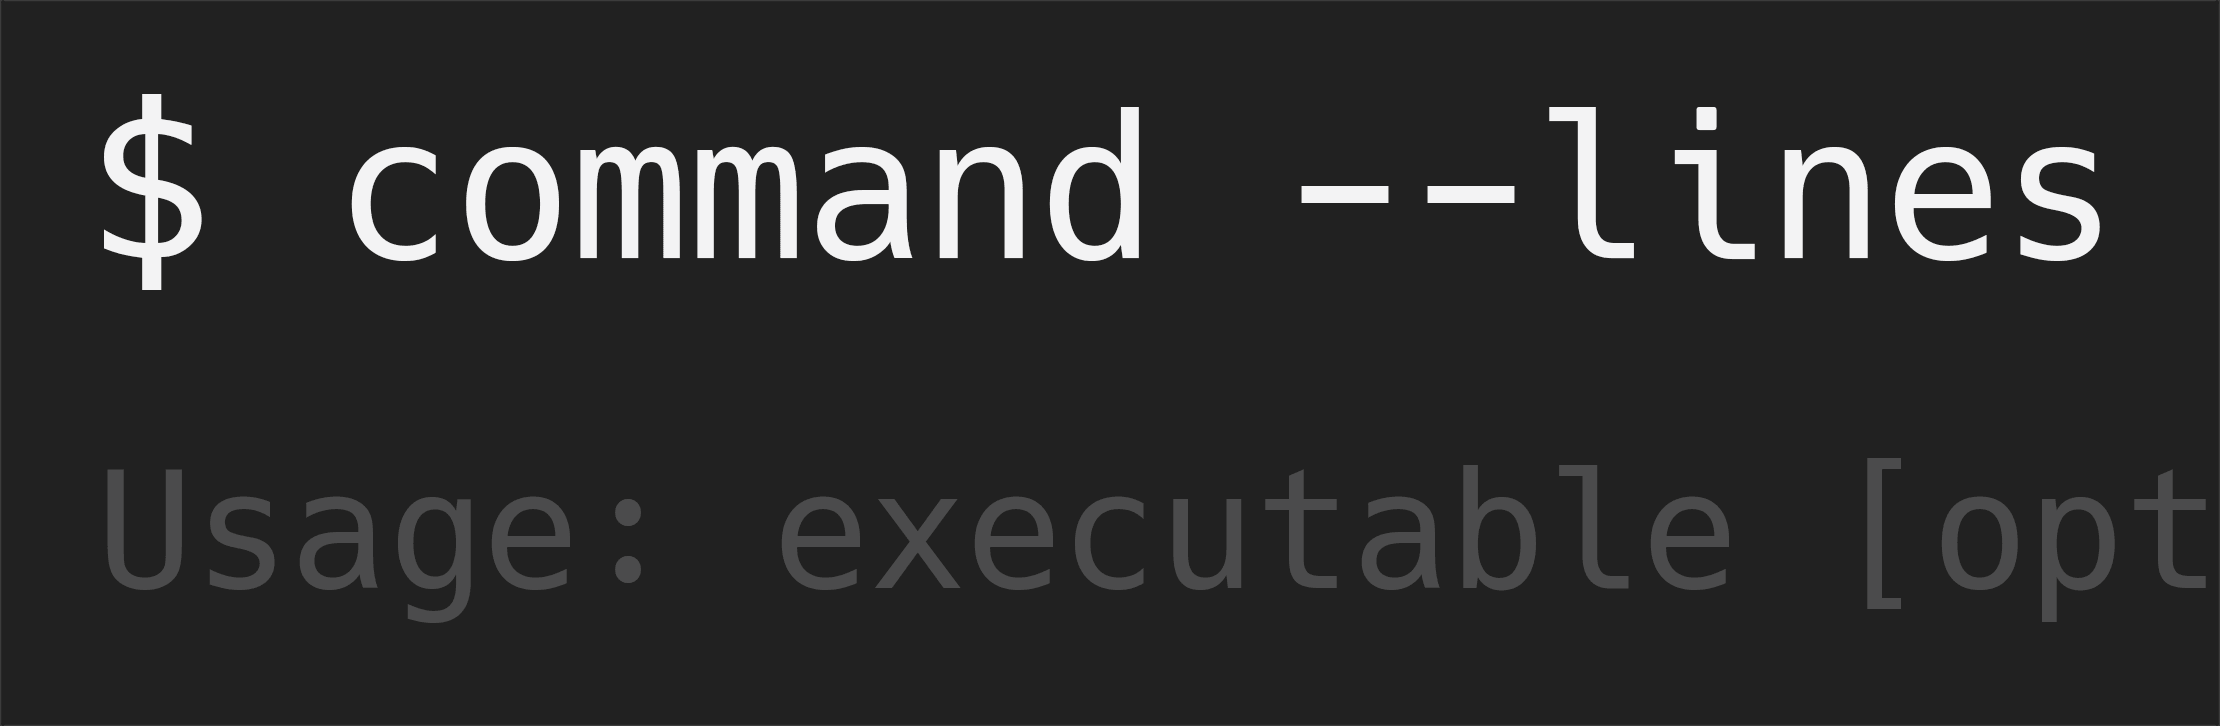 commandlines